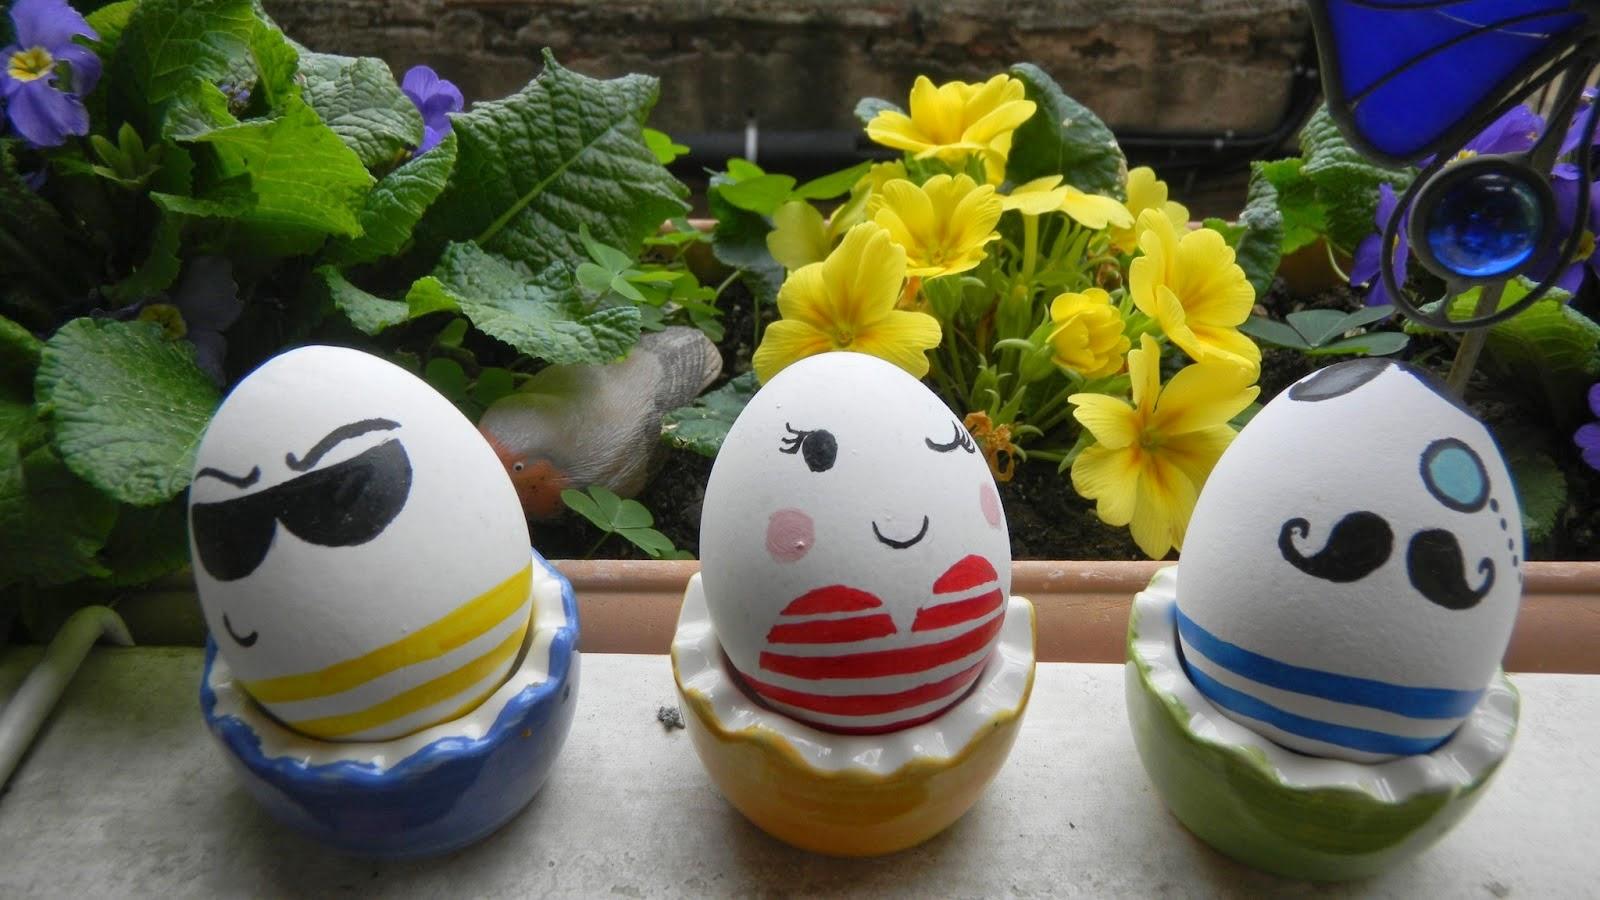 Qtlhd diy hoy decoramos huevos de pascua - Huevos decorados de pascua ...